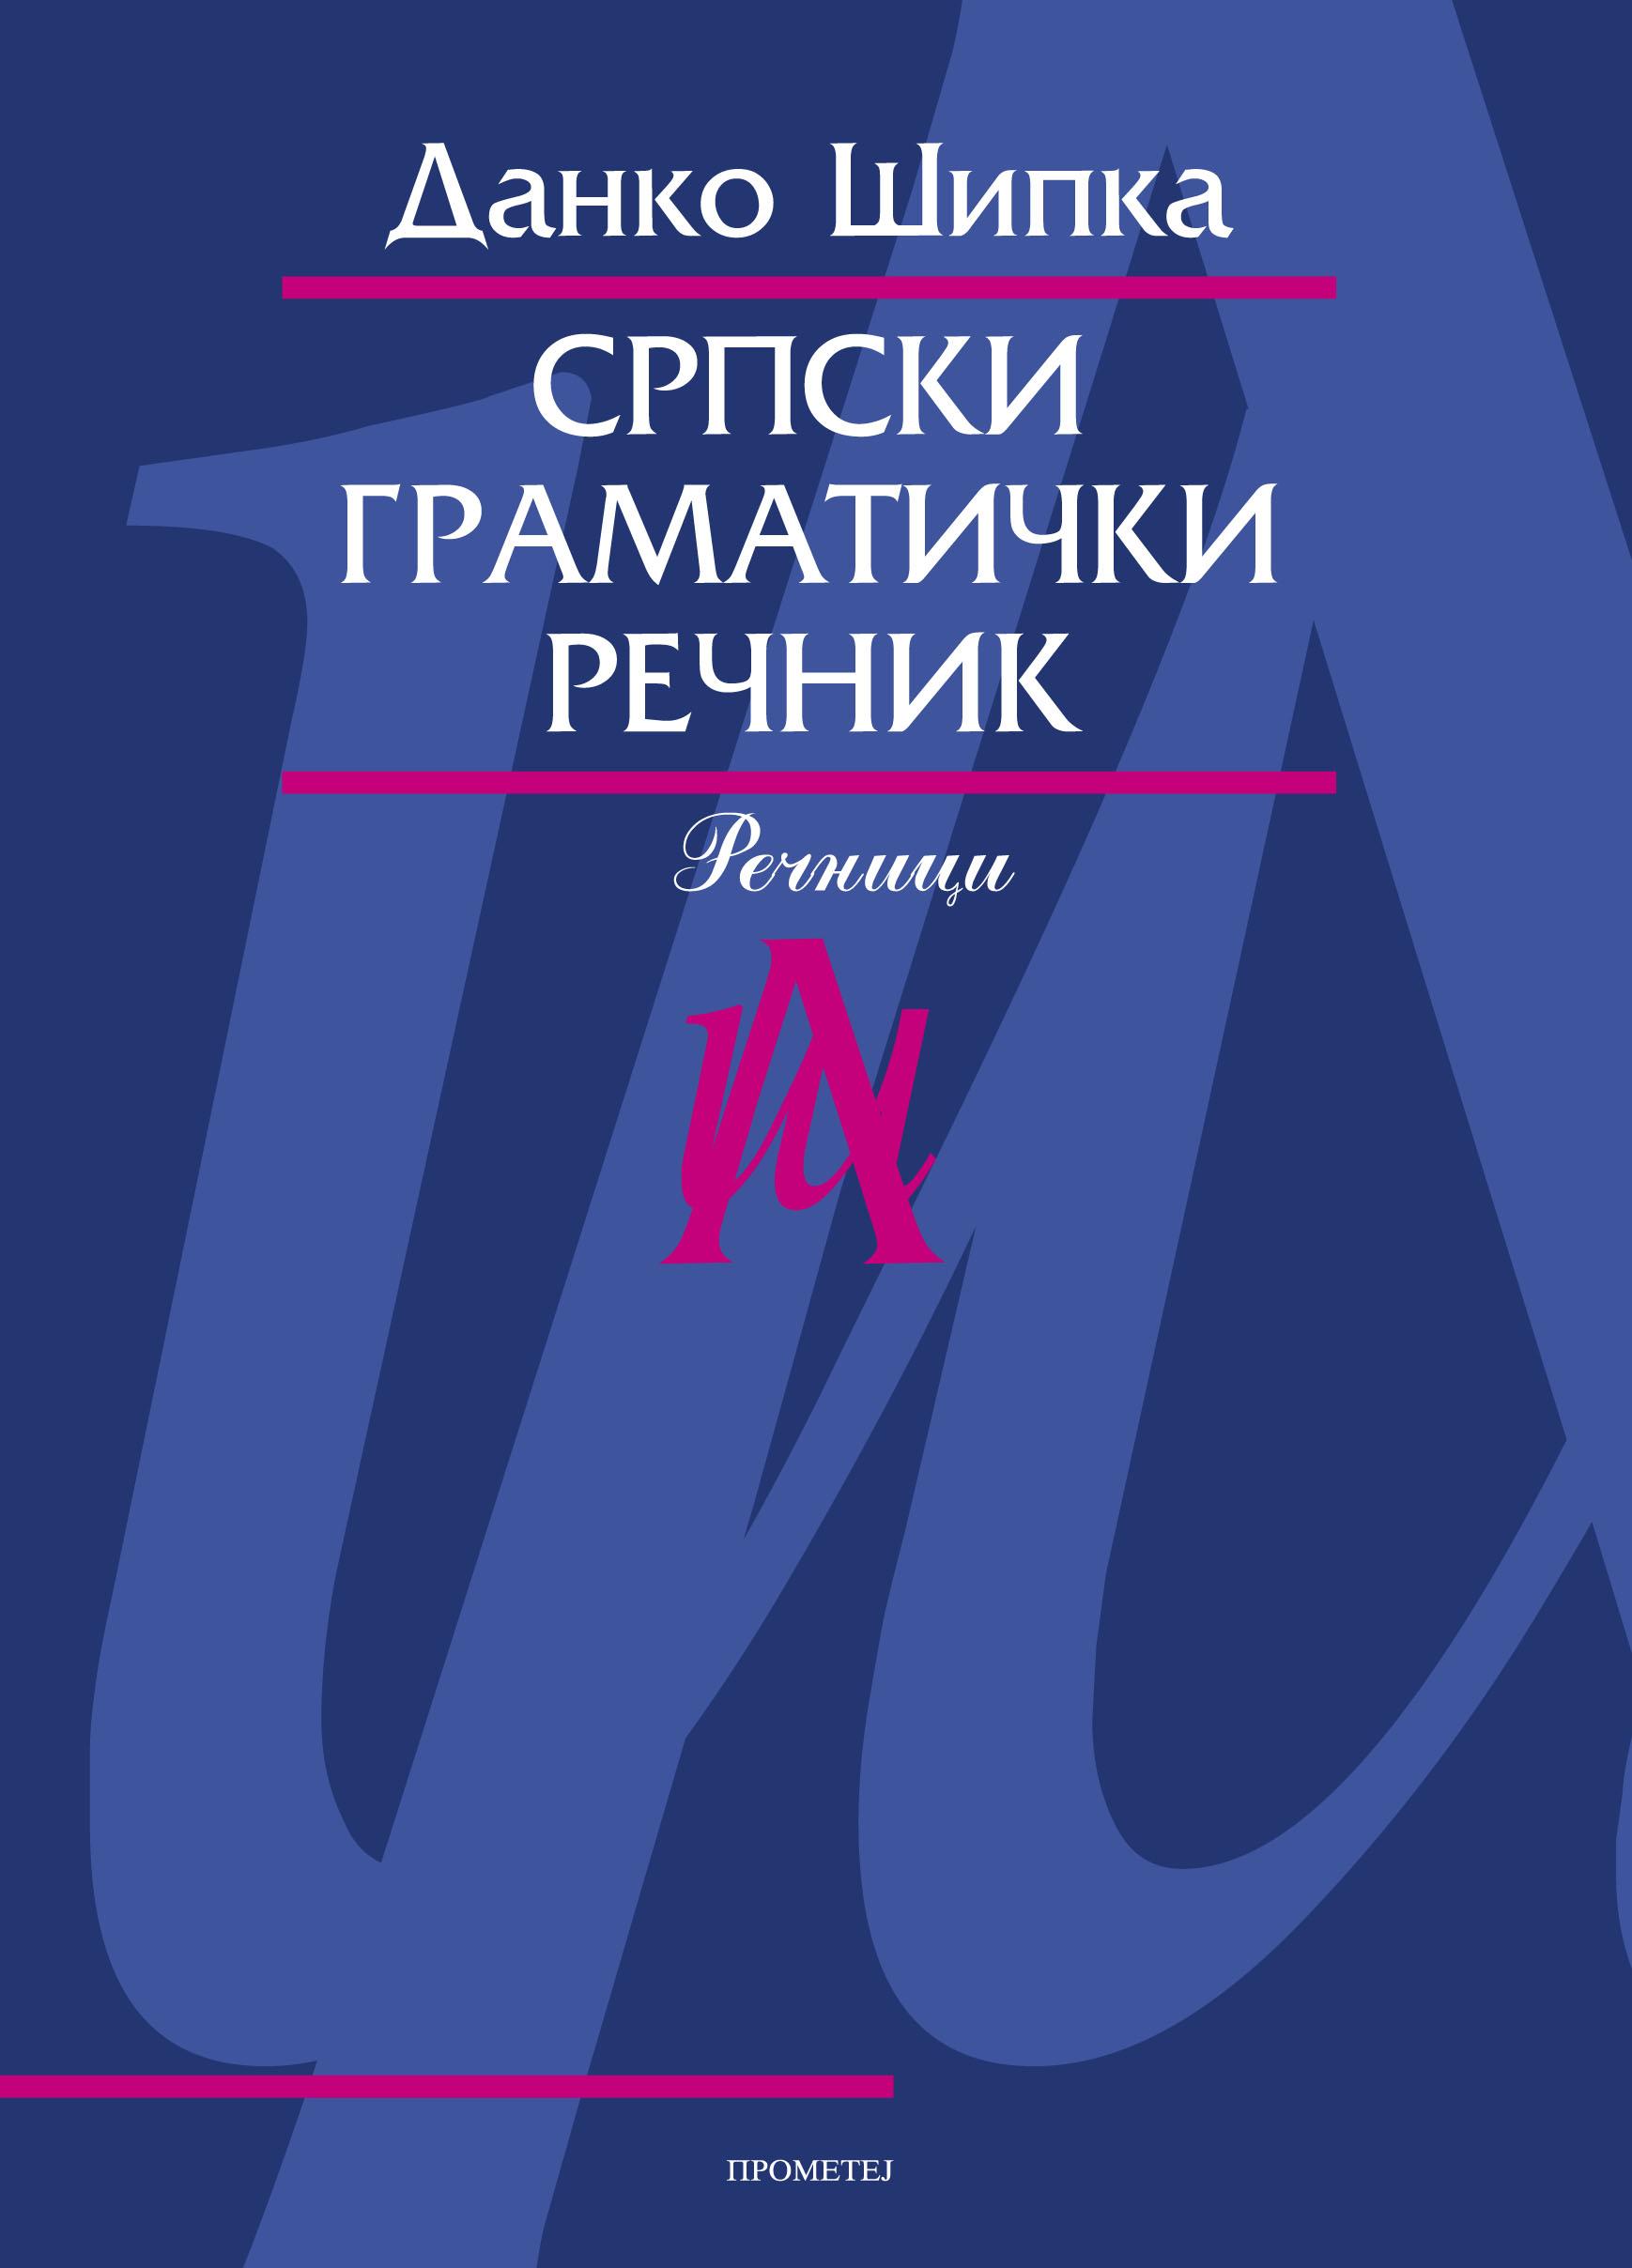 Српски граматички речник